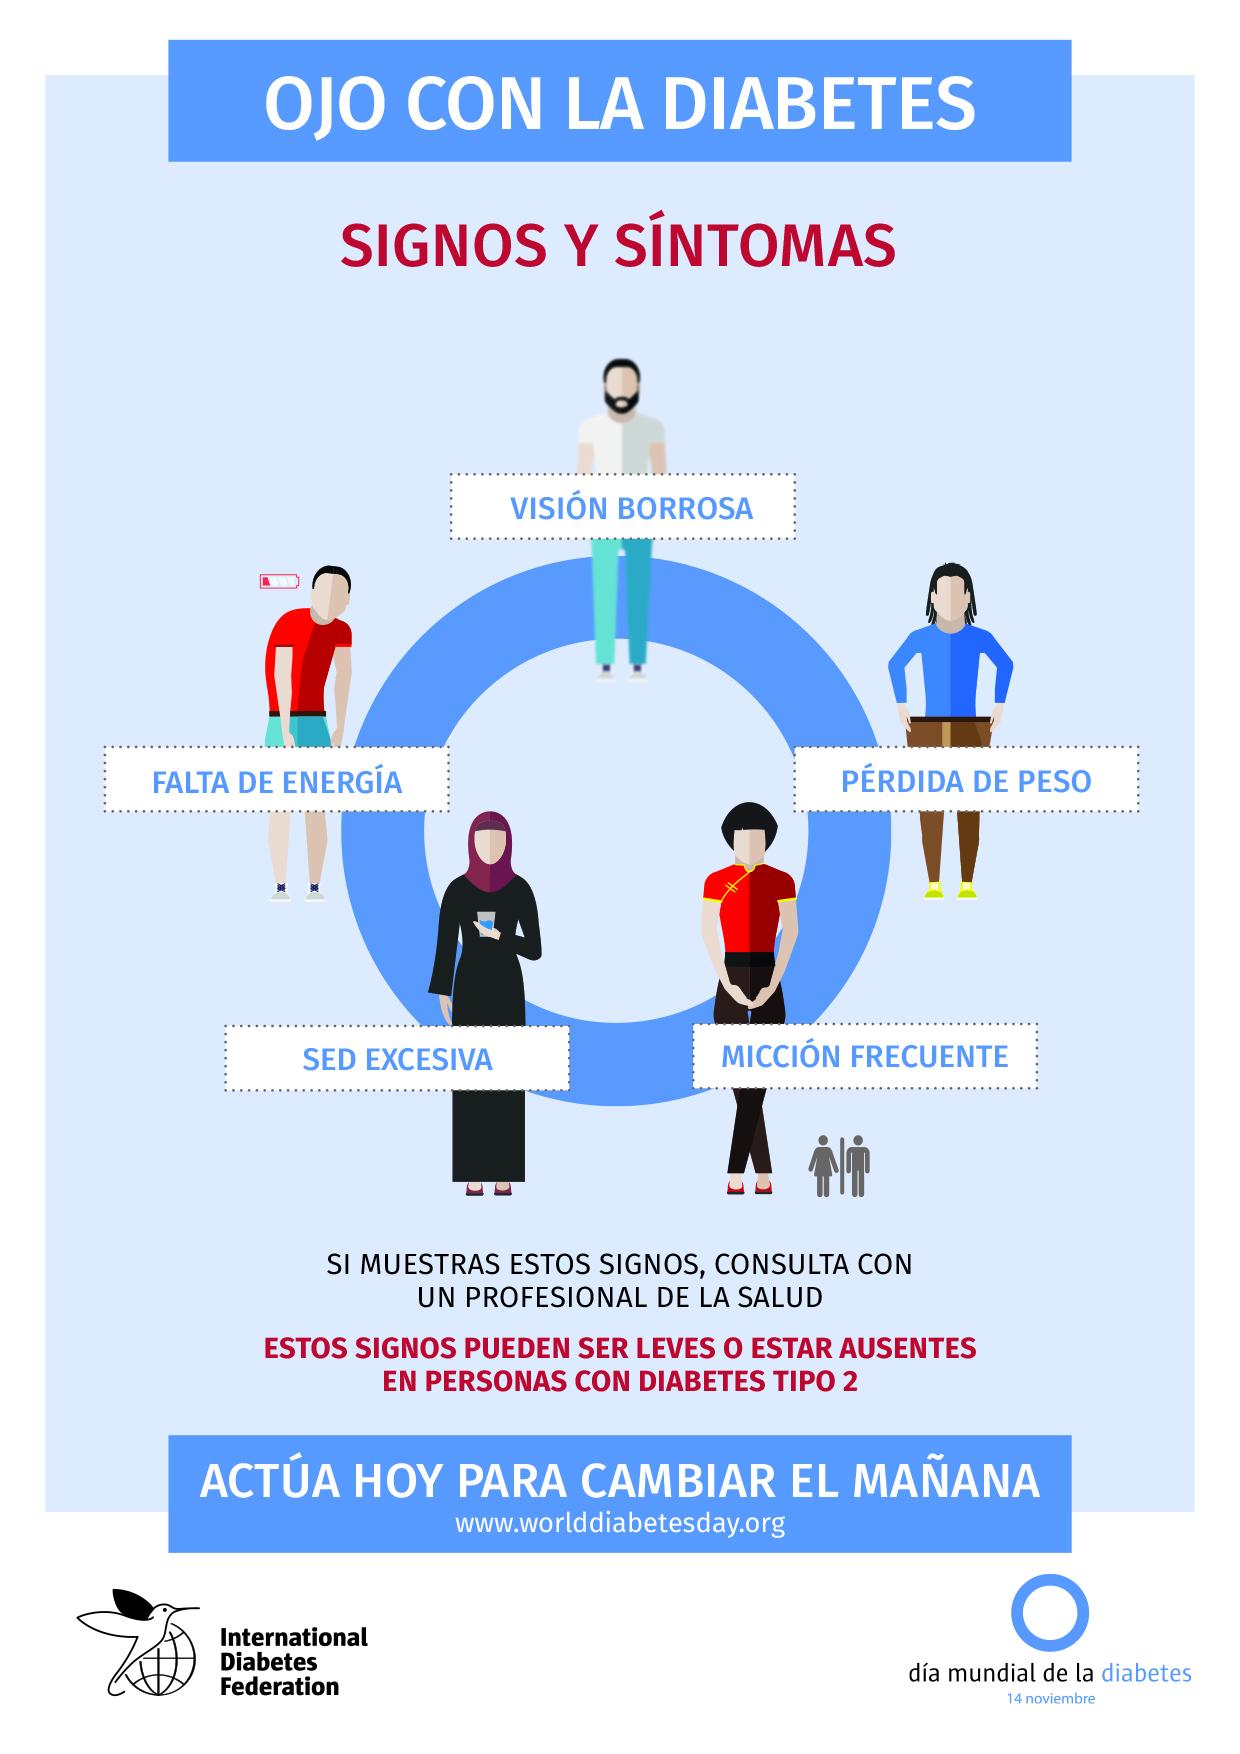 What Is Diabetes International Diabetes Federation | Male